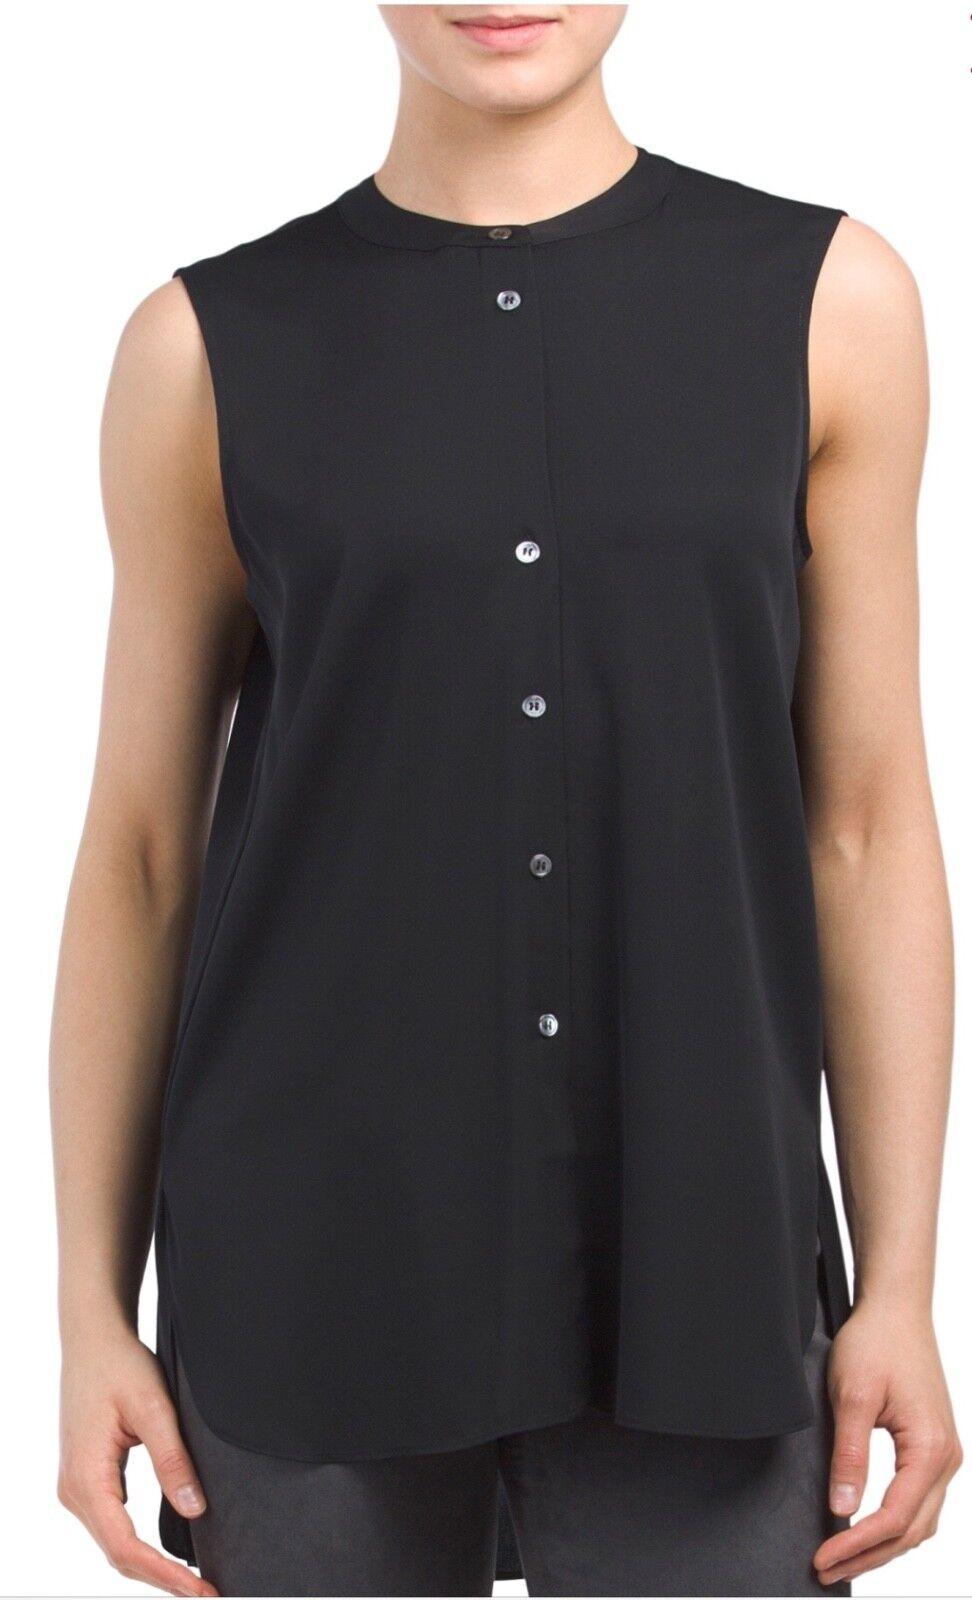 NWT Theory Hinzin R Sleeveless Stretch 100% Silk Tunic Top, schwarz - Größe Small